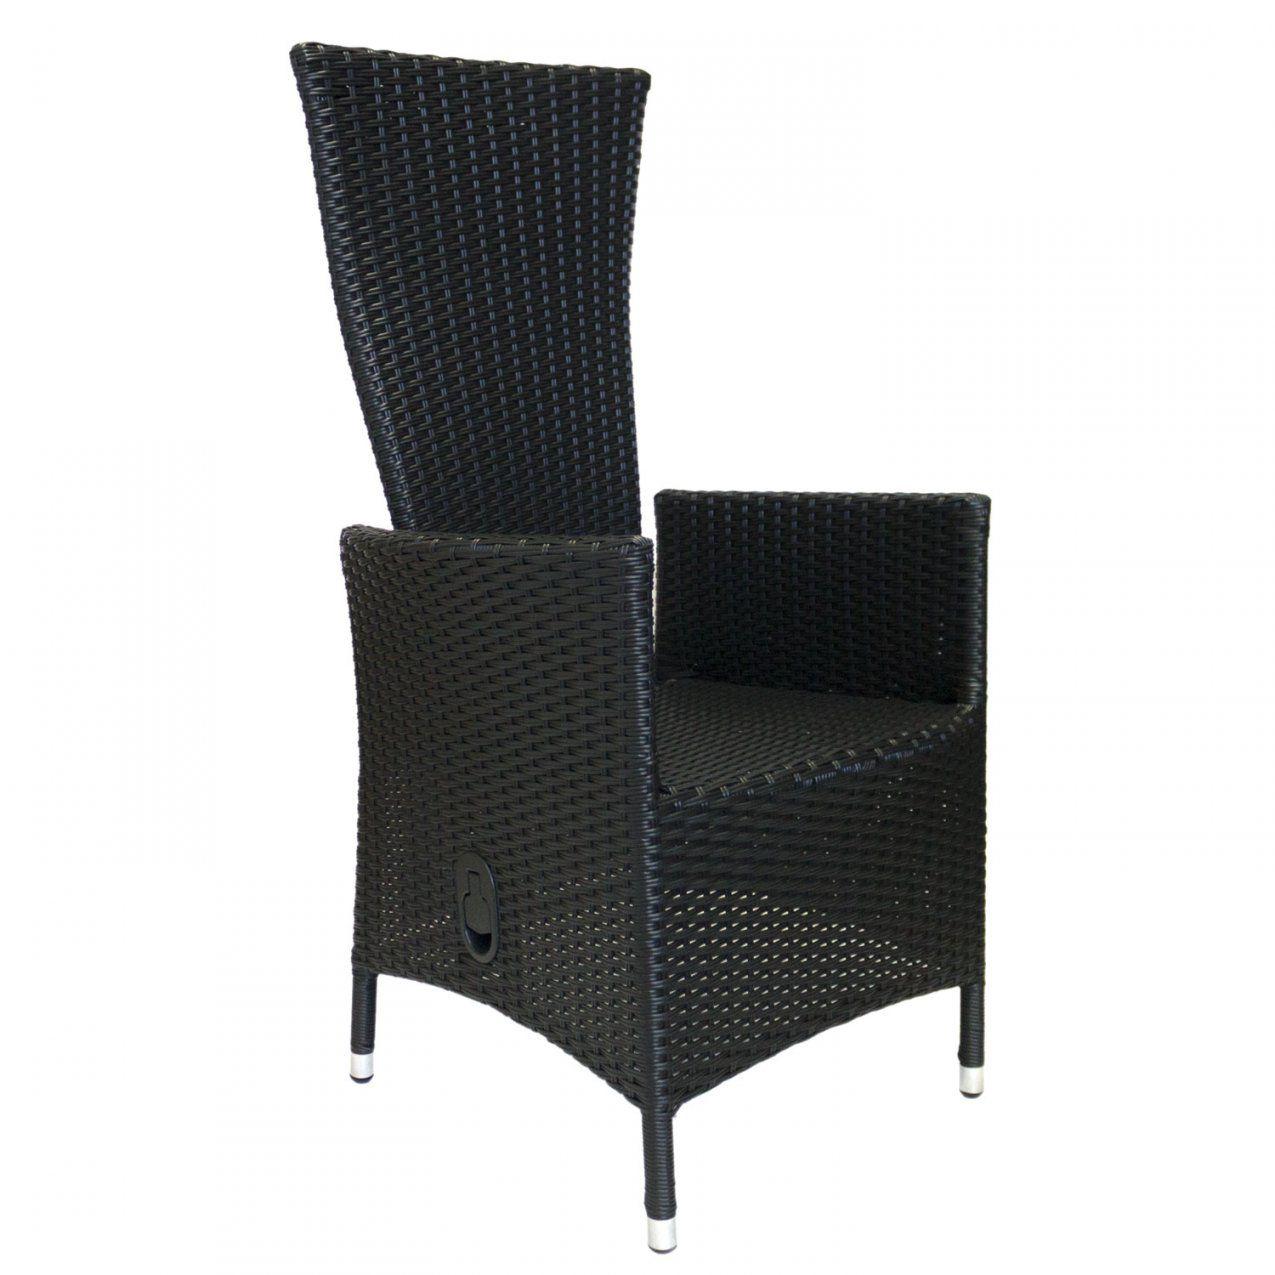 Polyrattan Sessel Lea Schwarz Stufenlos Verstellbare Rückenlehne von Polyrattan Sessel Verstellbarer Rückenlehne Photo